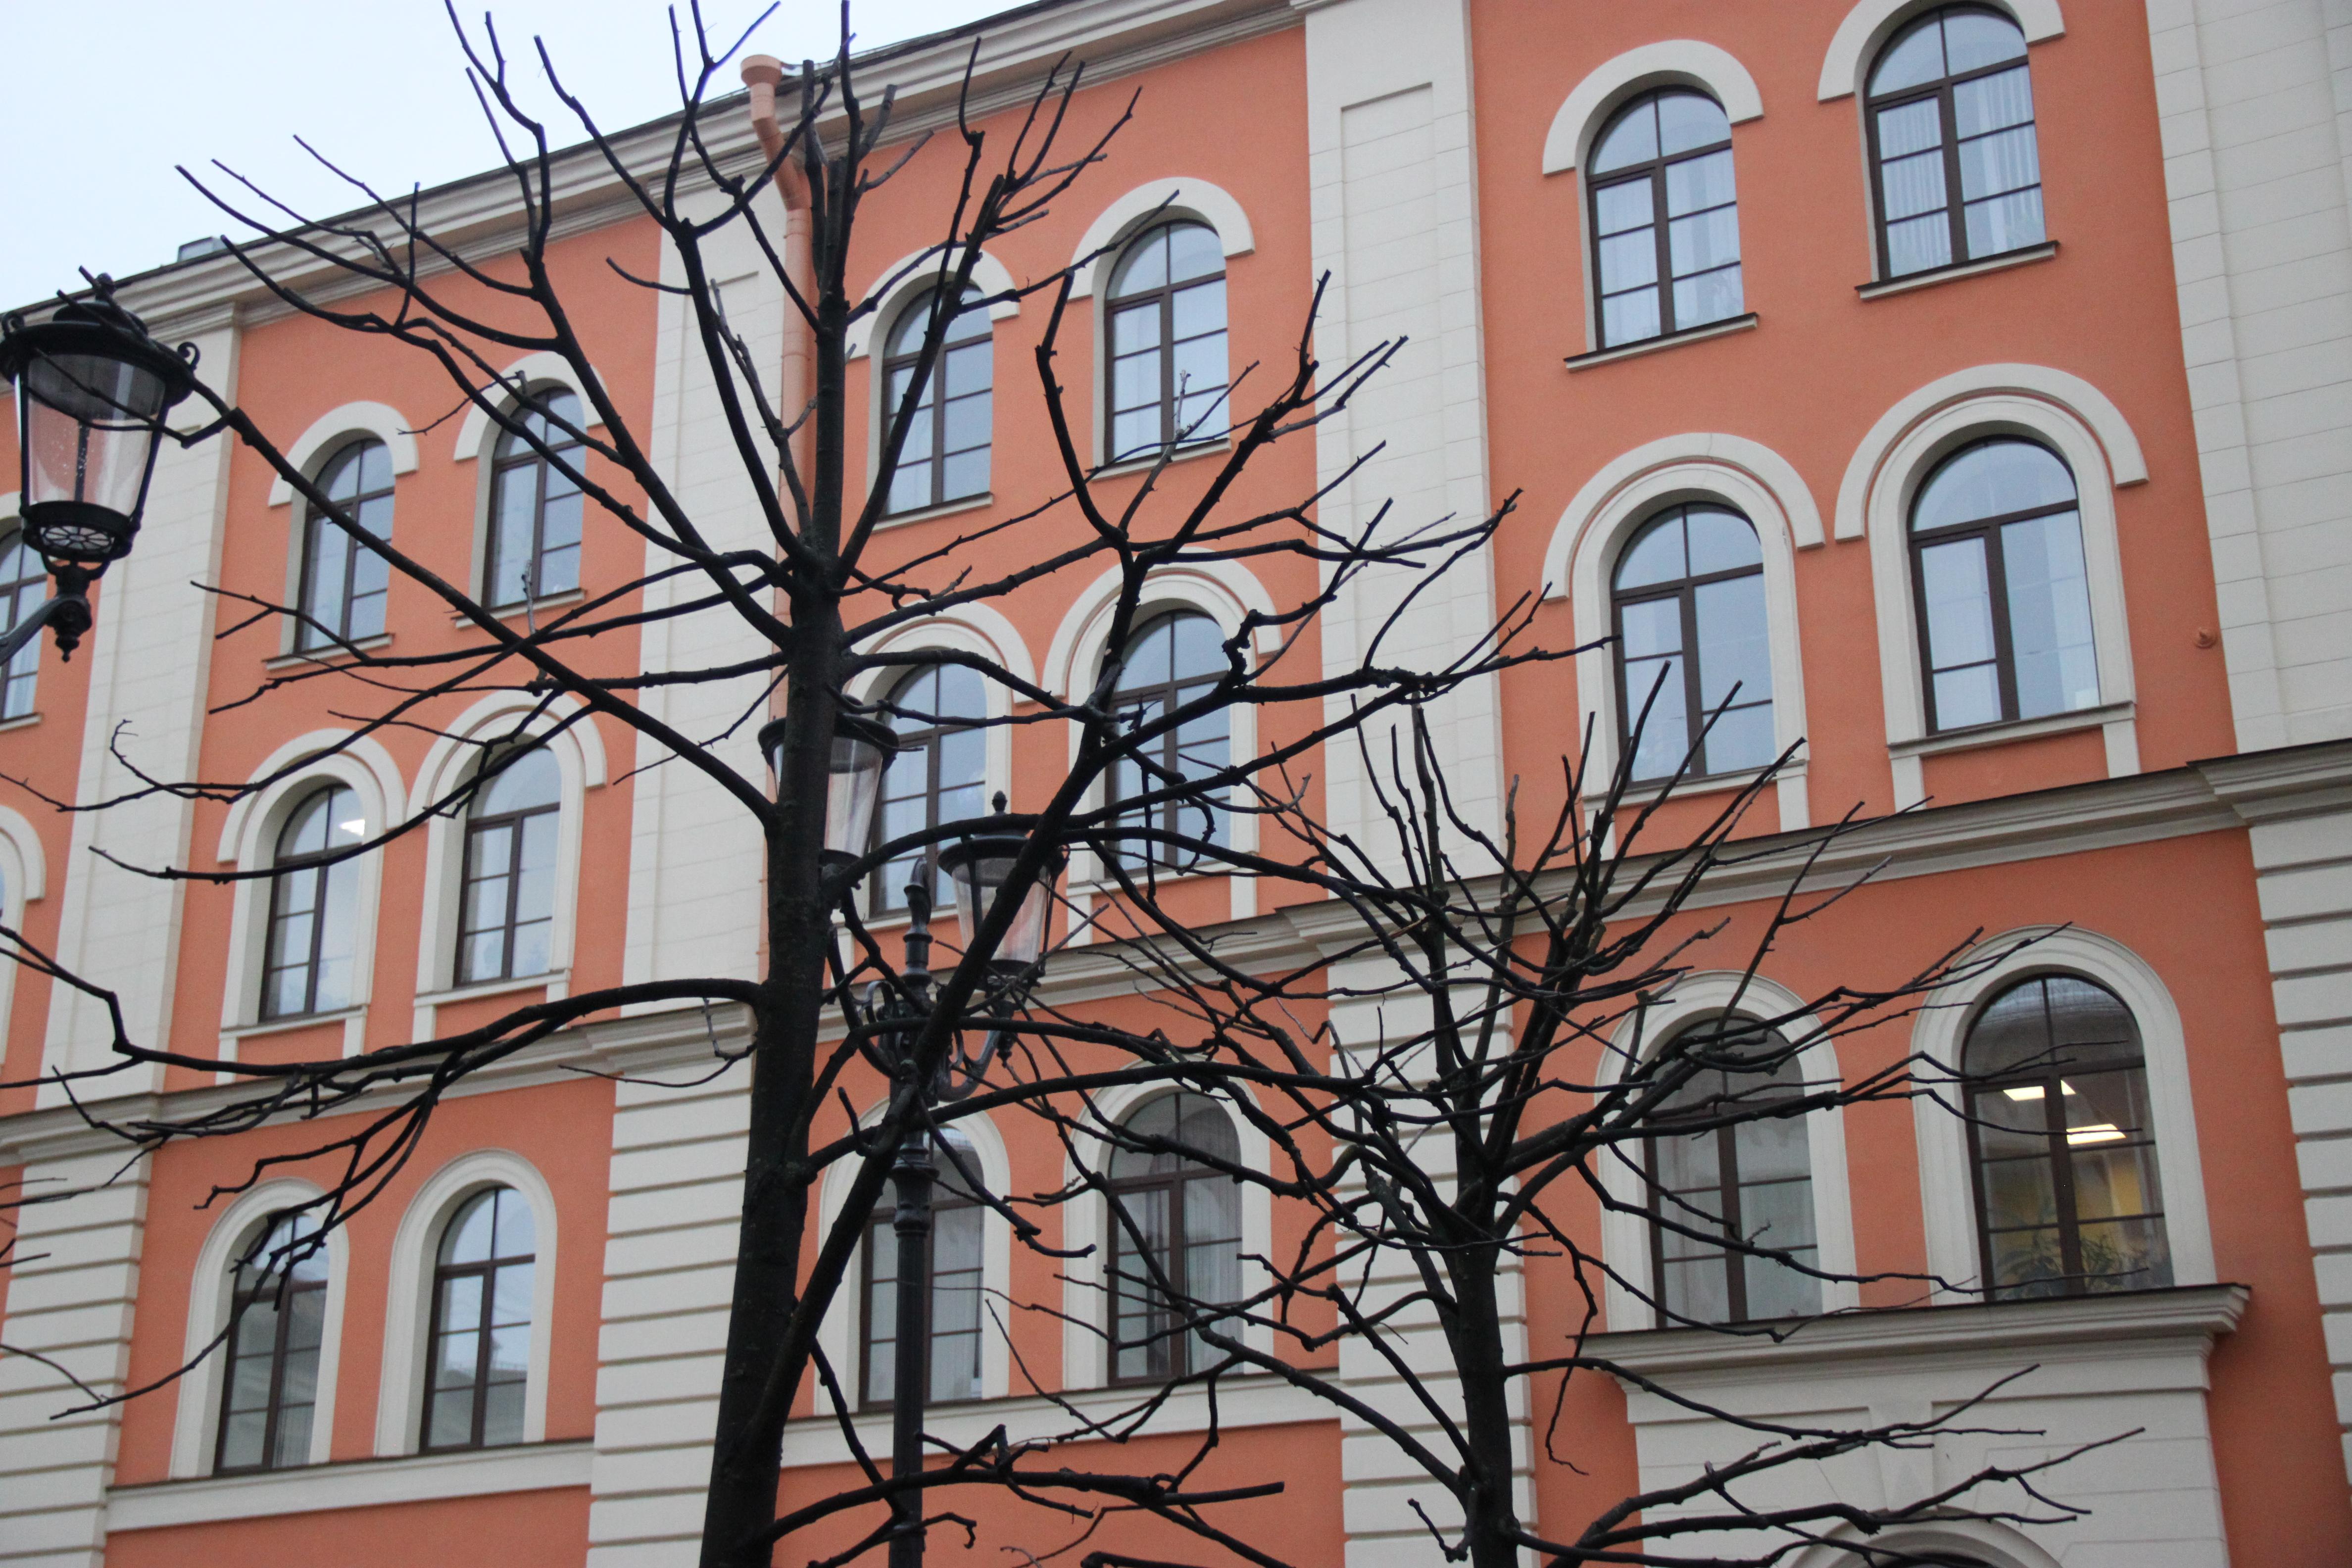 File:Saint Petersburg, Russia (36930756541) jpg - Wikimedia